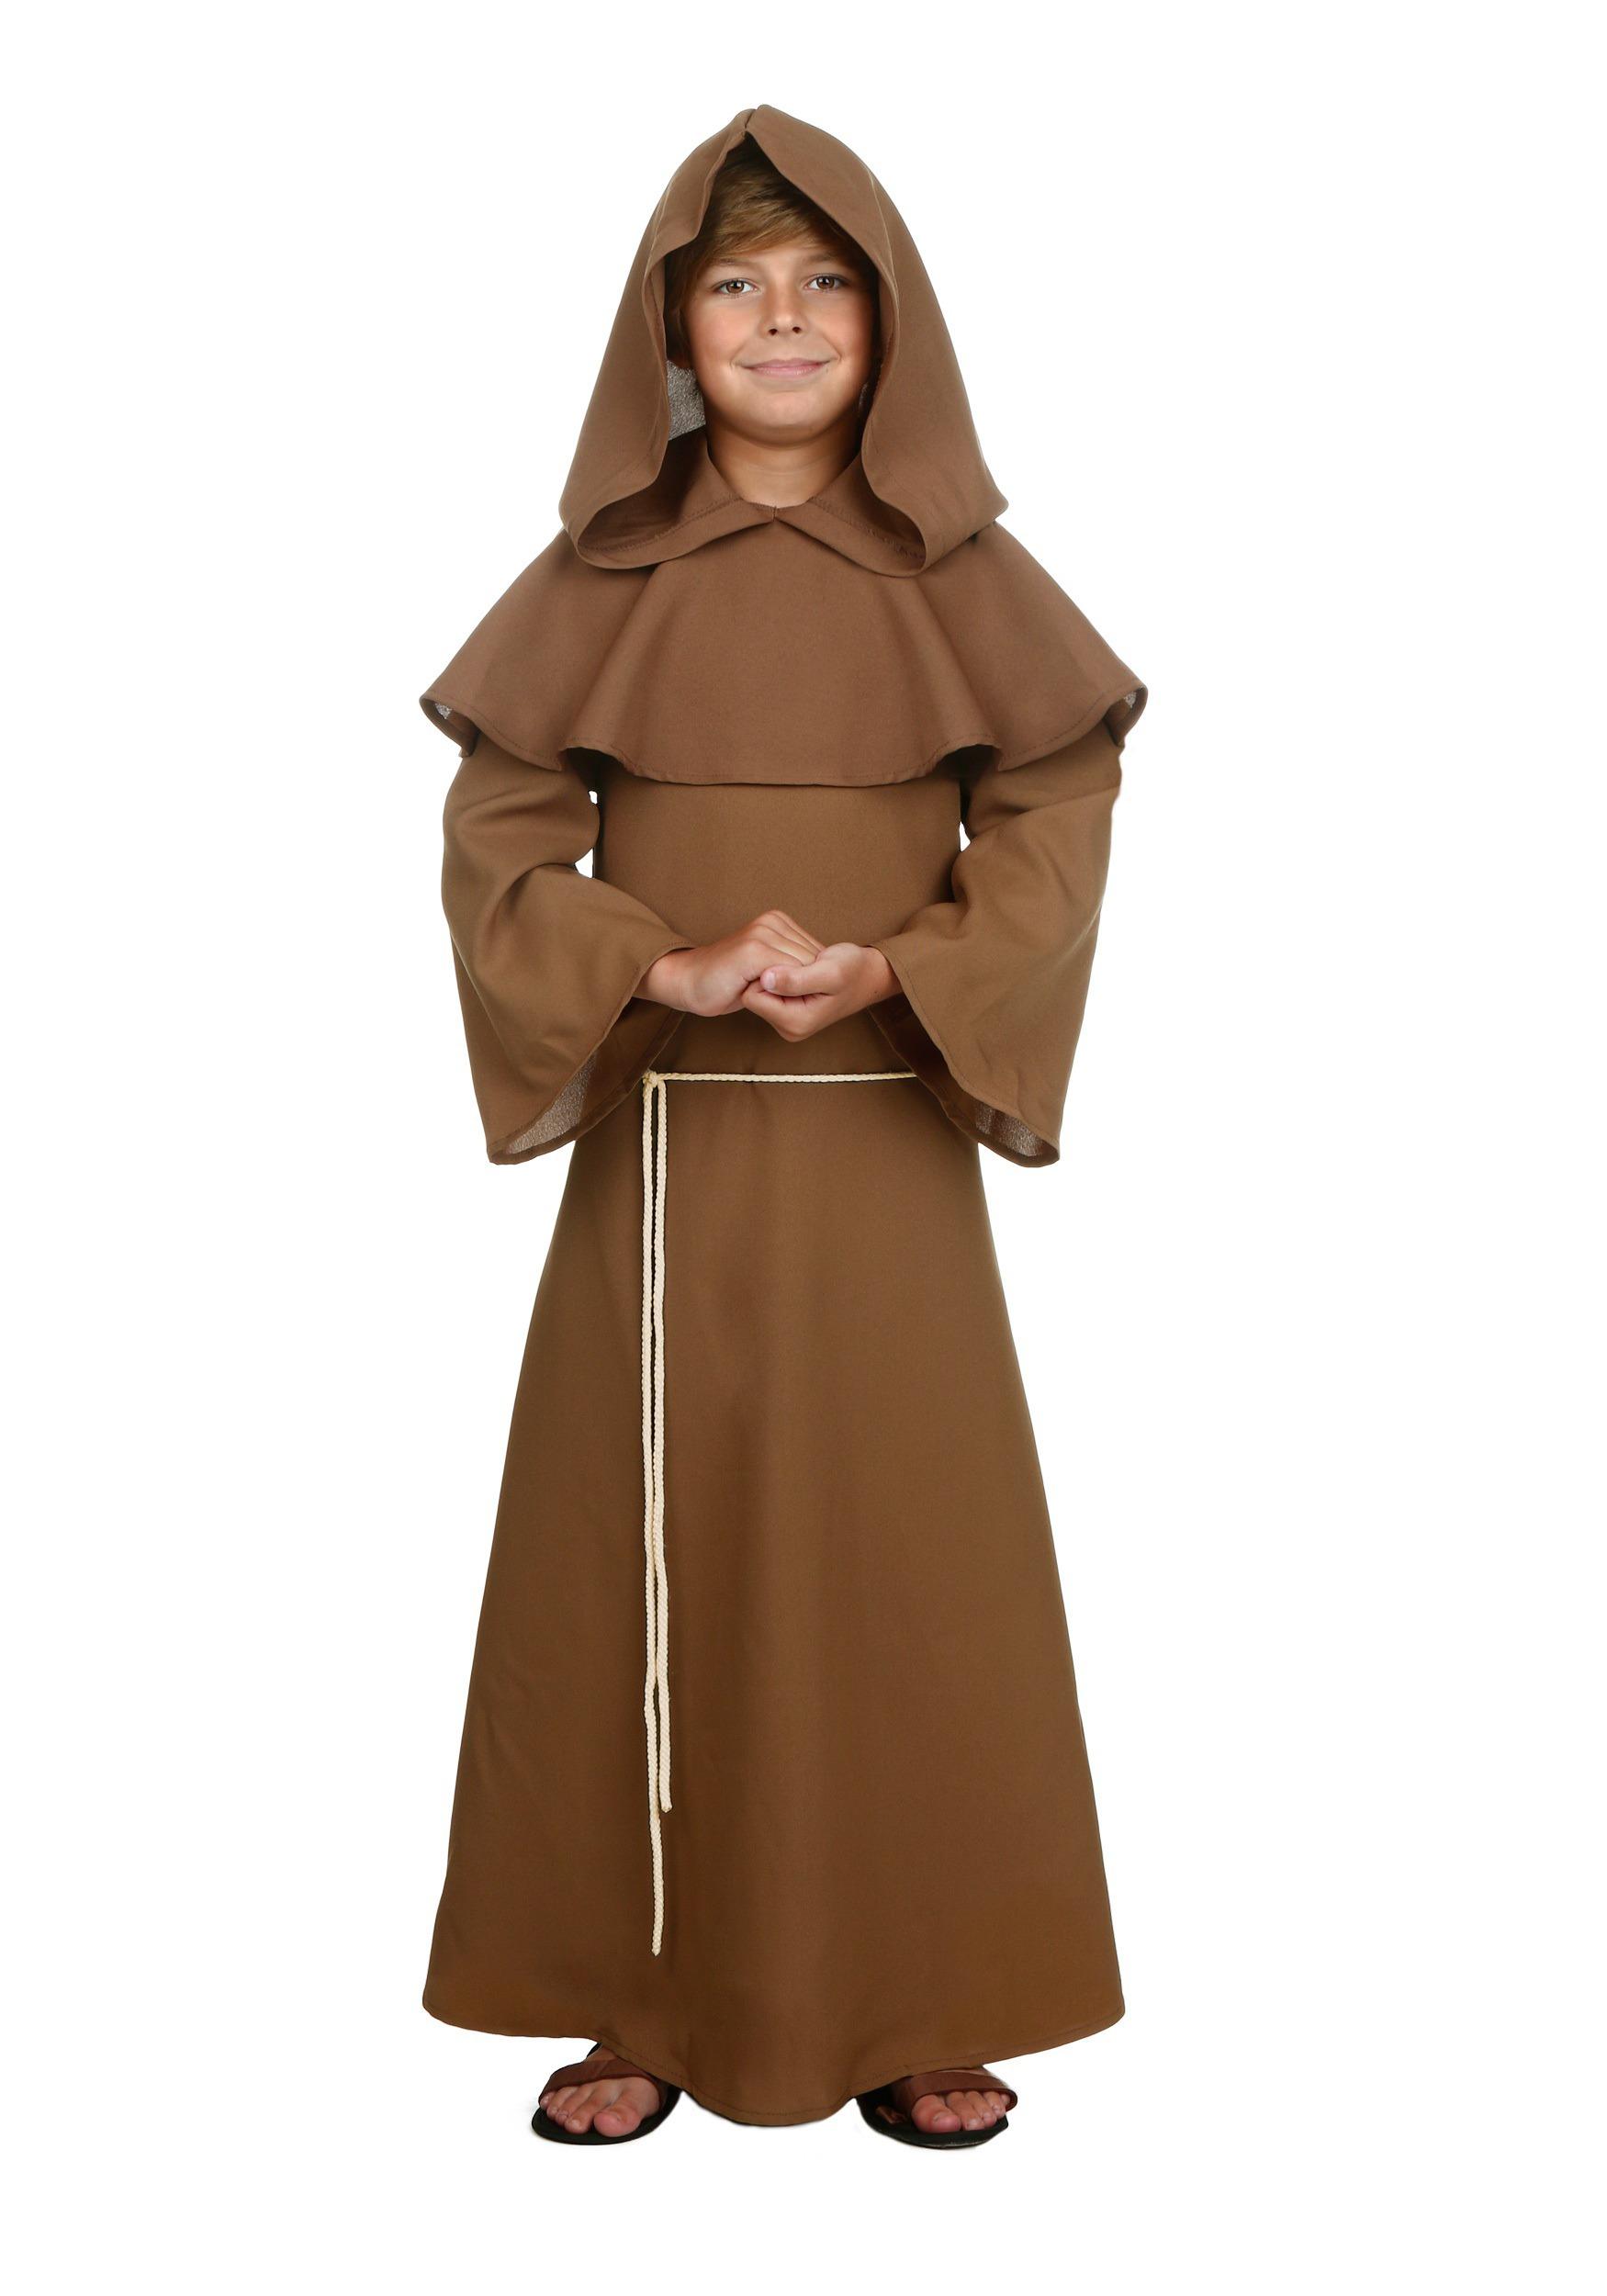 Child Brown Monk Robe Costume